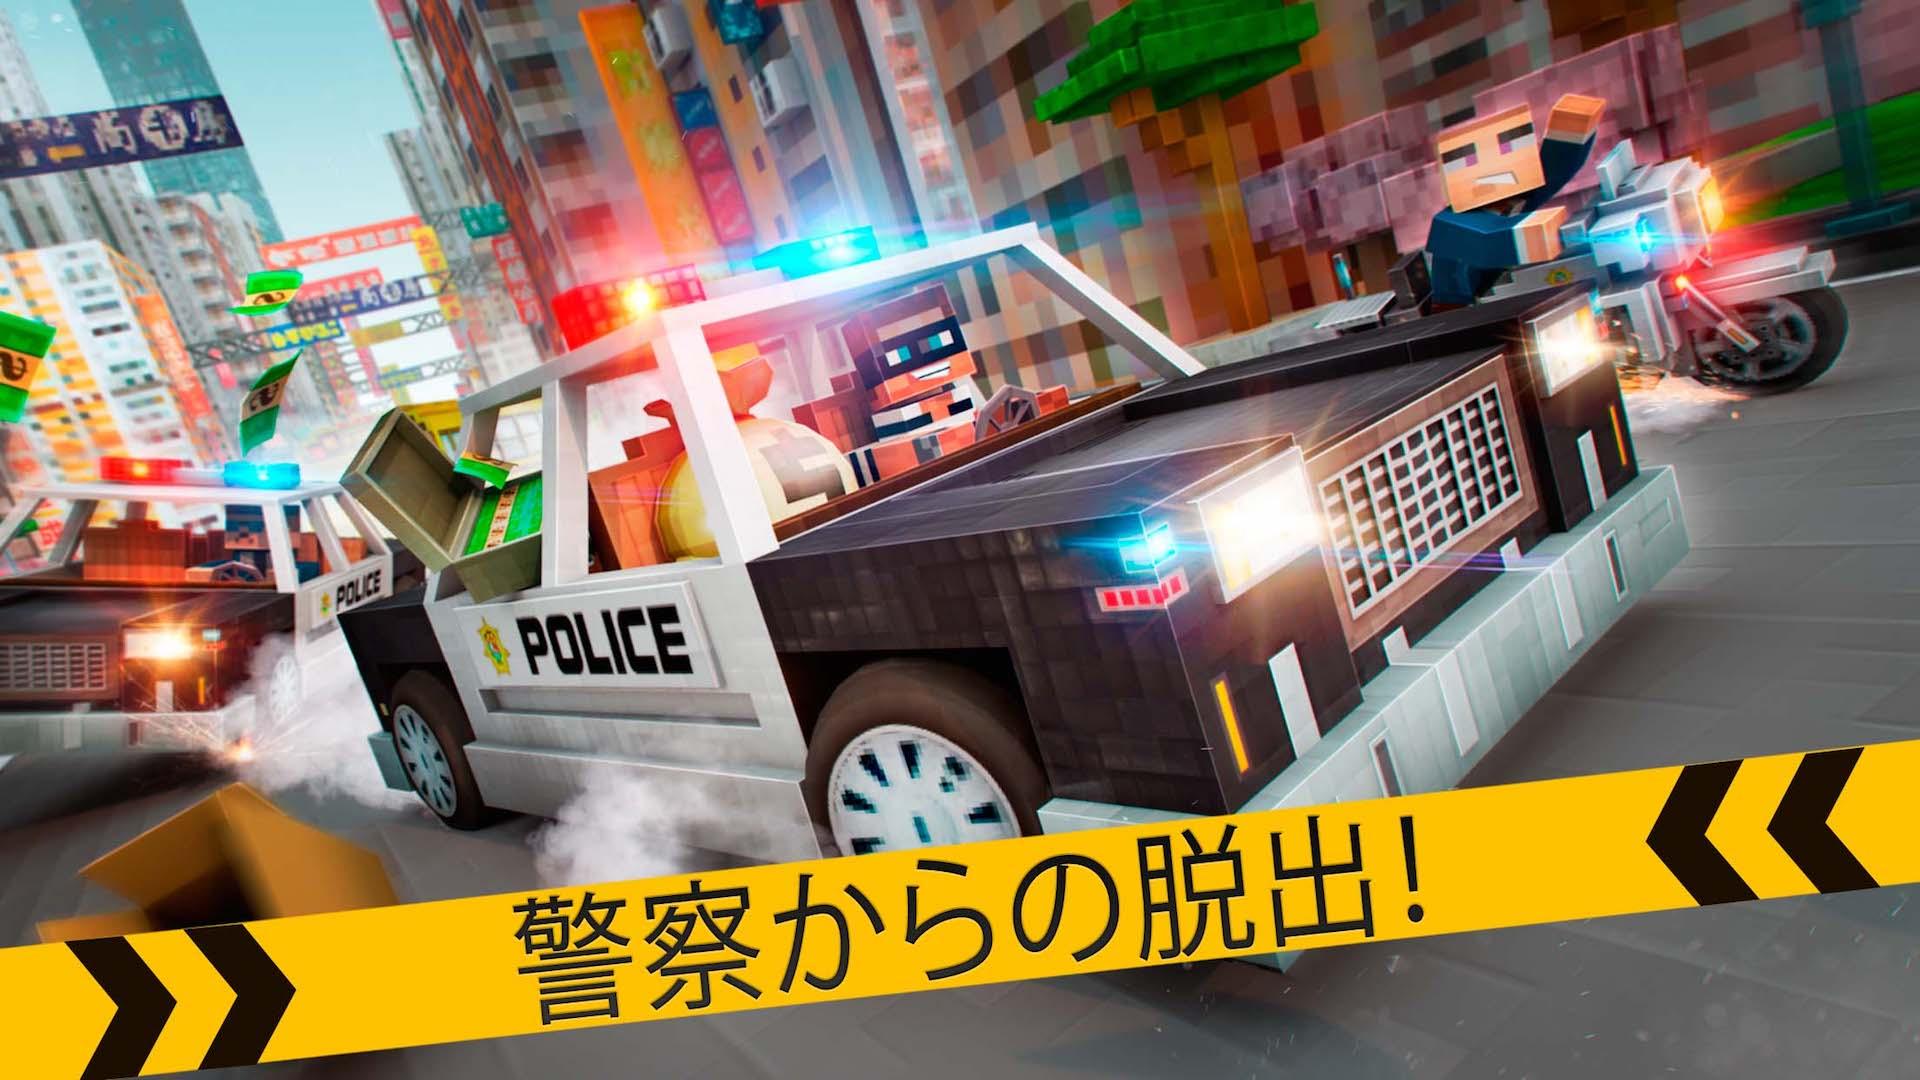 mp3tag 日本 語 amazon co jp